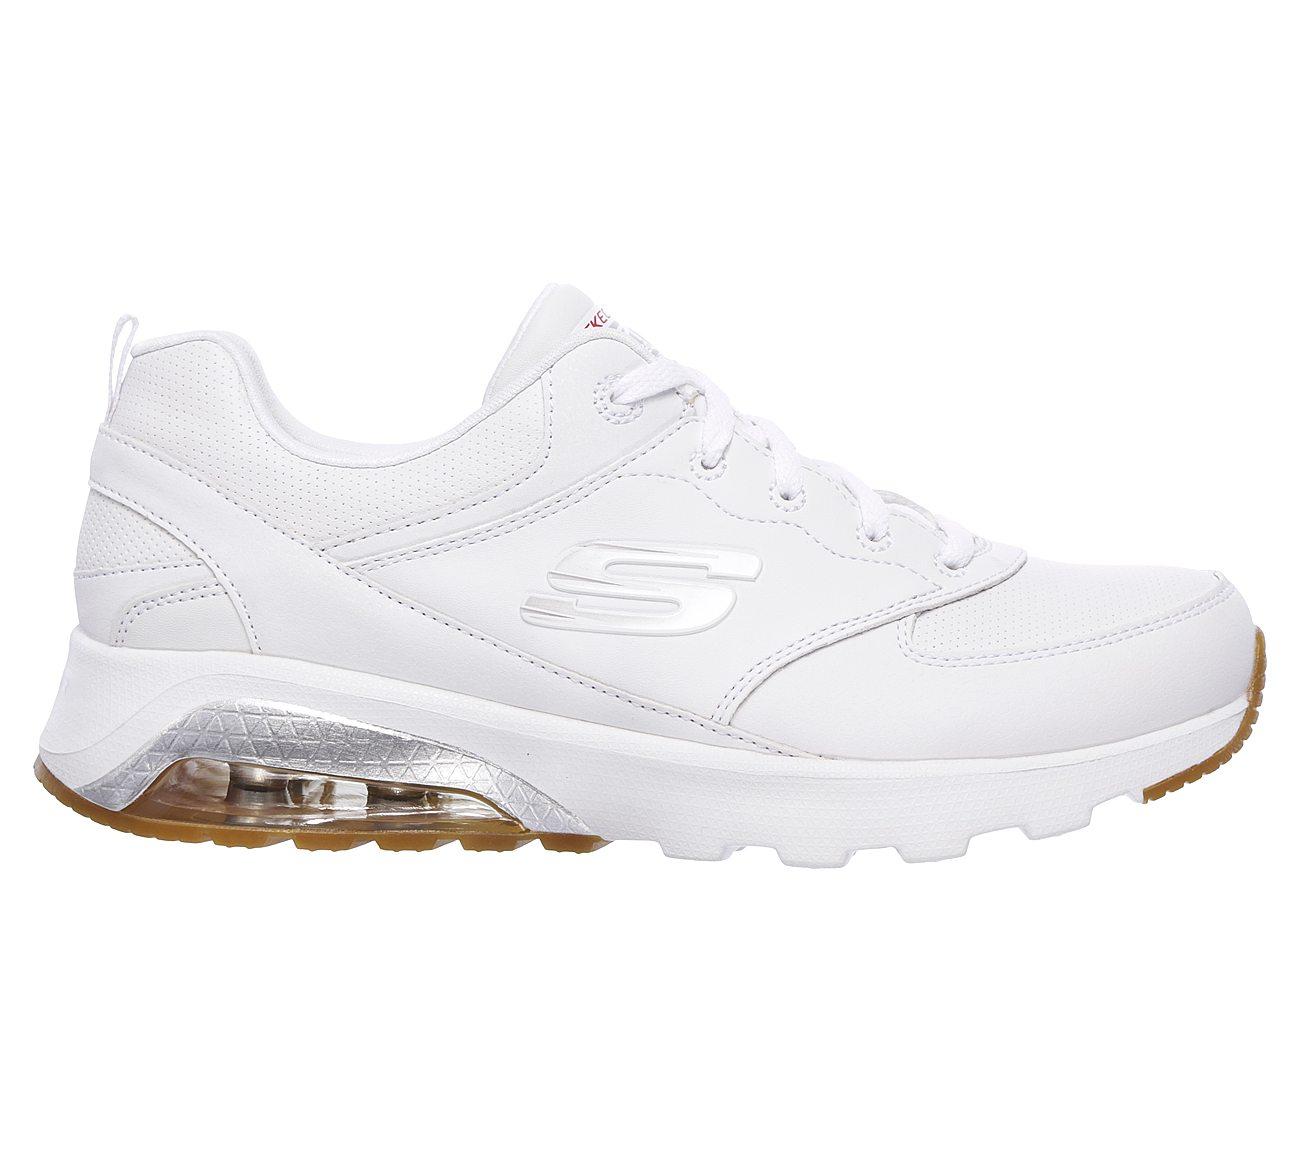 e5ea58d2dff8d8 Buy SKECHERS Skech-Air Extreme - Onward Skech-Air Shoes only $50.00